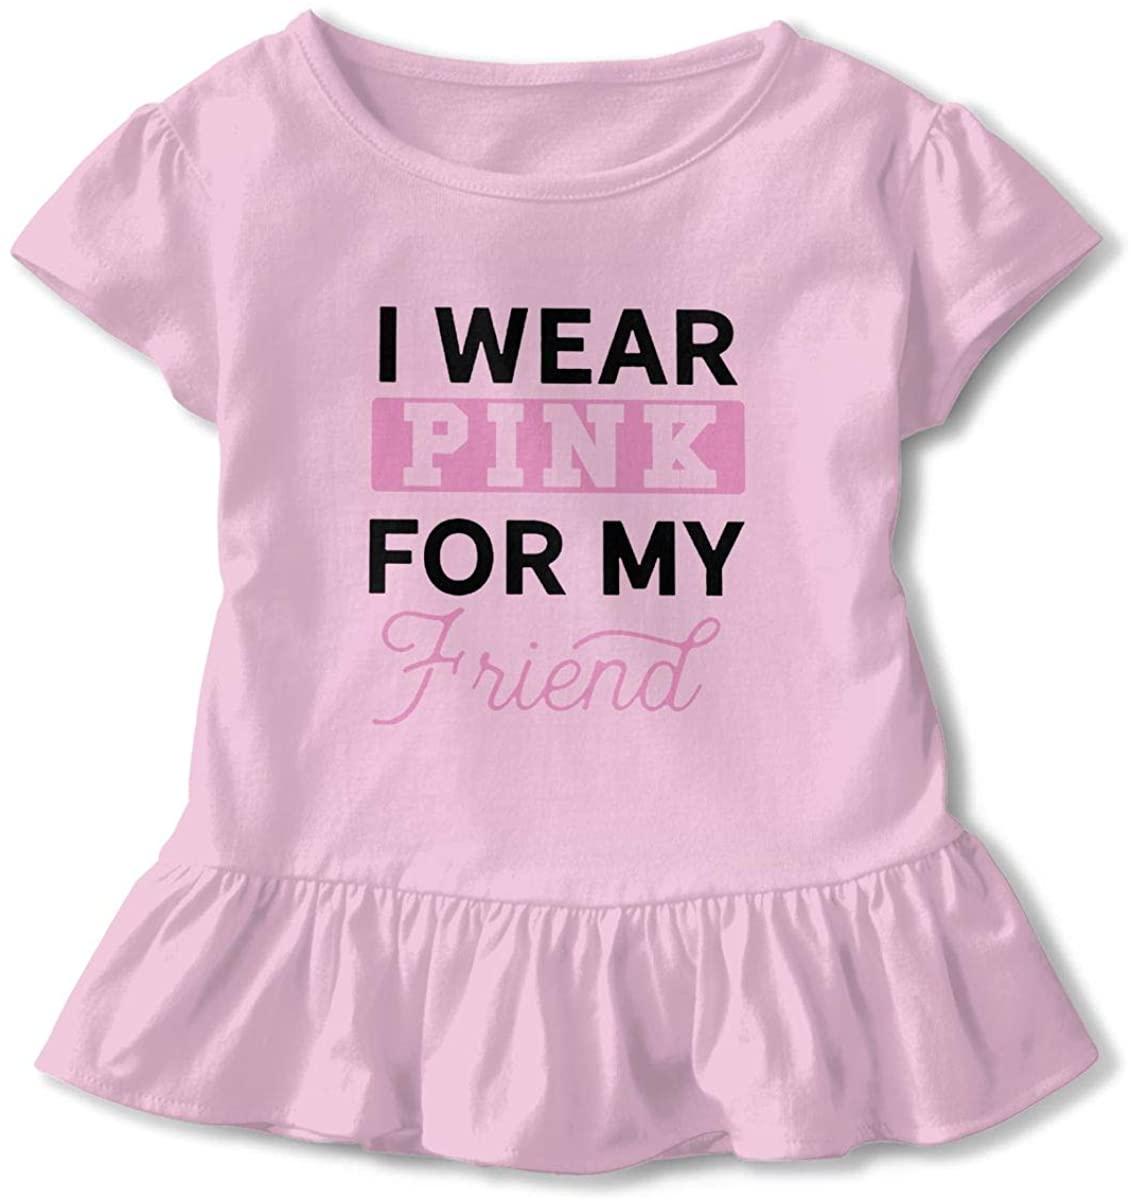 AHUAHUA Kids Breast Cancer Awareness Gifts Toddler Short Sleeve T Shirt Children Girls Cotton Graphic Tee Soft Dress (2-6T)